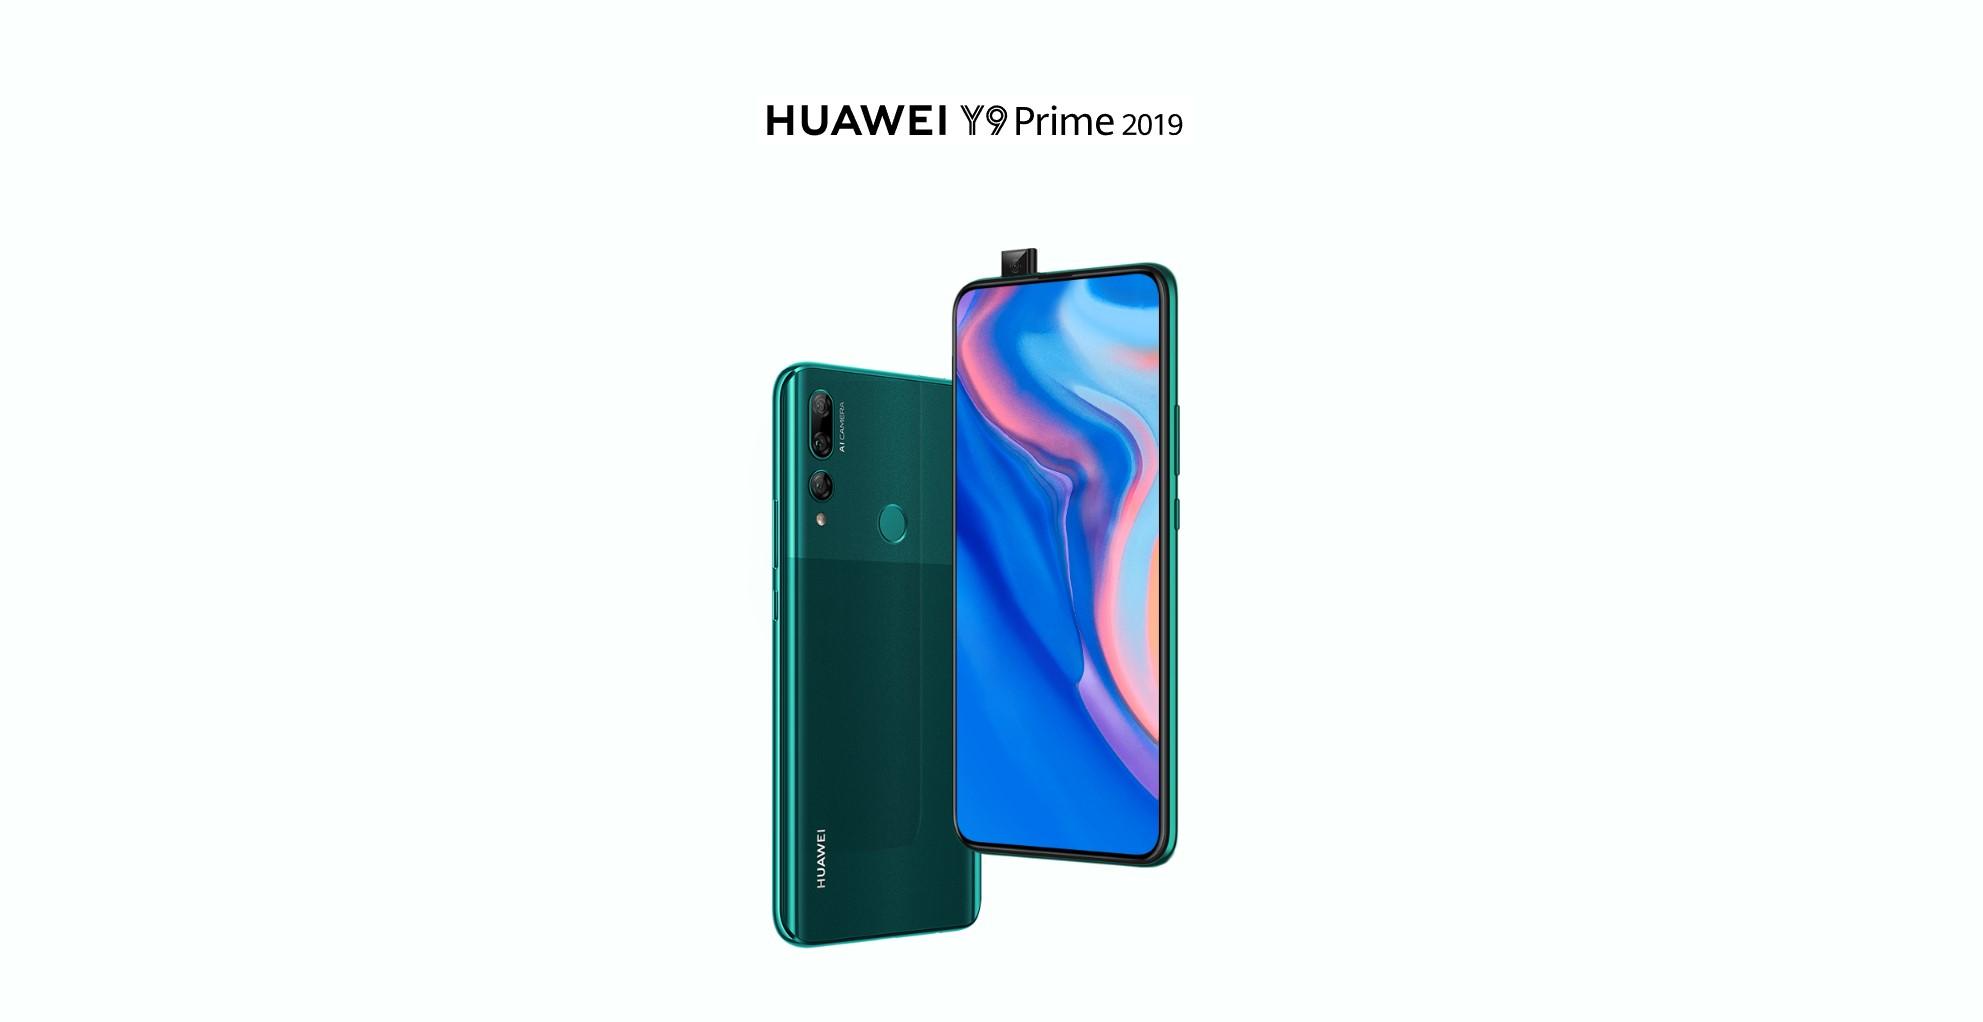 Huawei Y9 Prime 2019 je novinka s výsuvnou kamerou